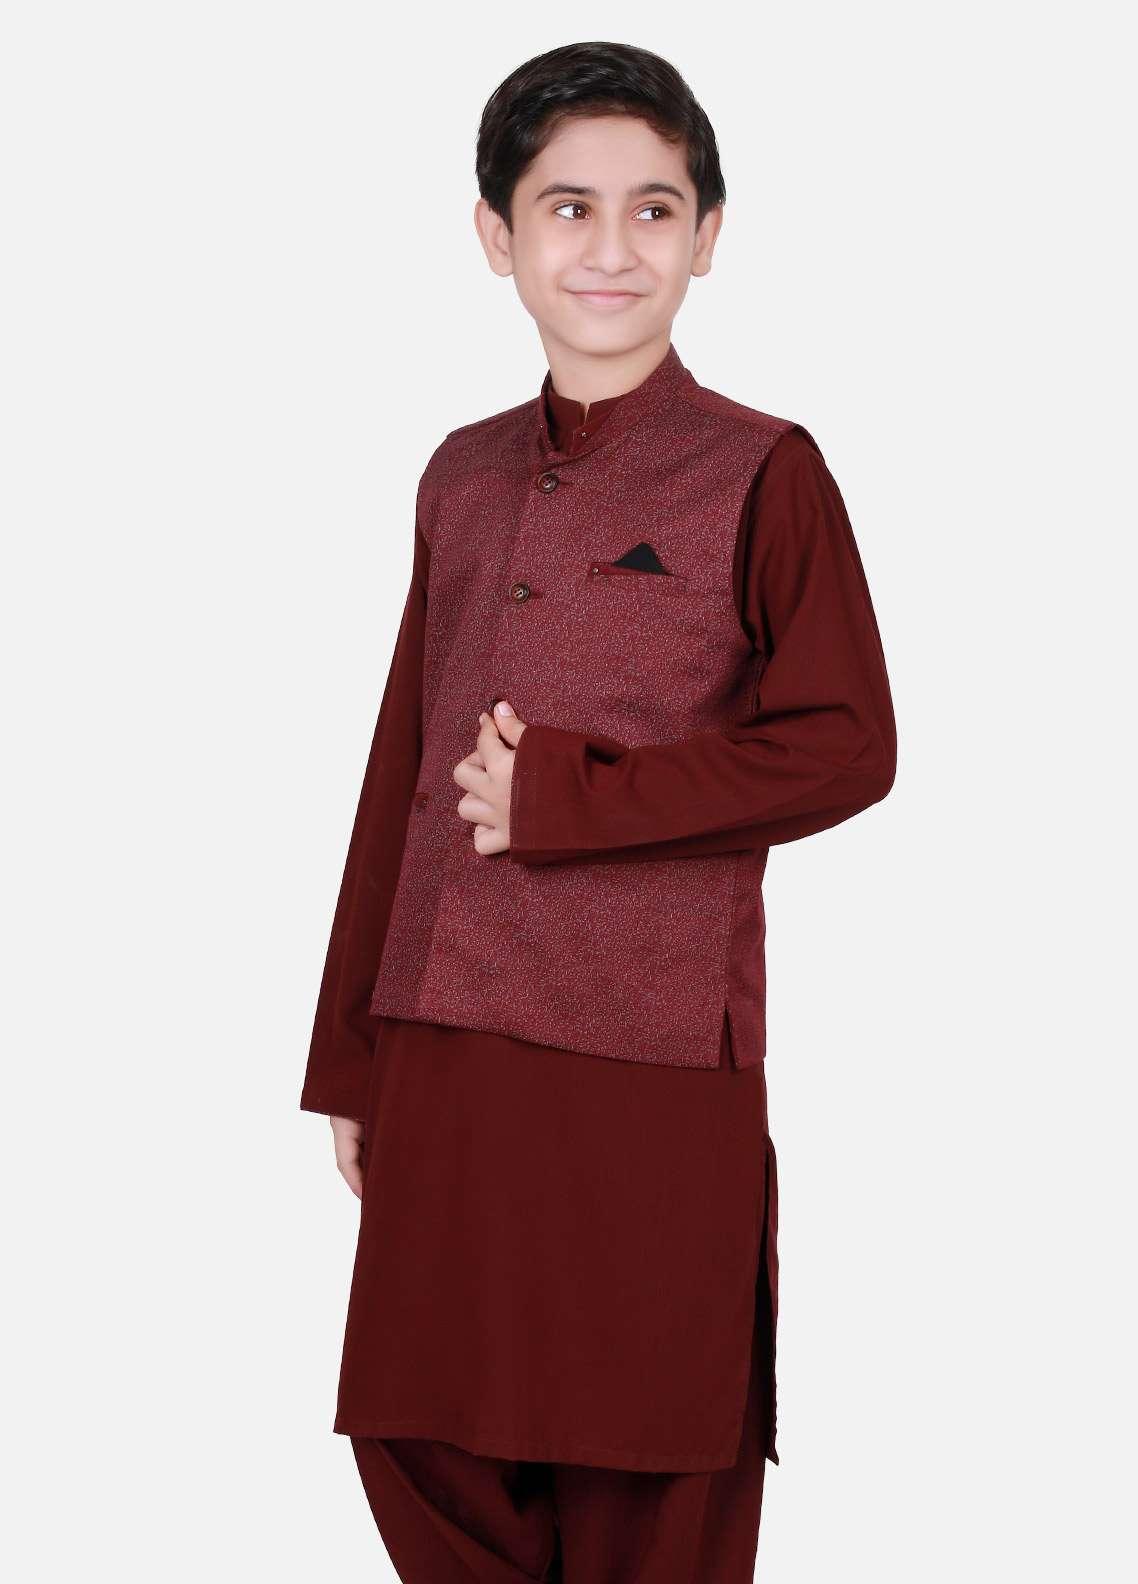 Edenrobe Cotton Plain Texture Boys Waistcoat Suits - Maroon EDW18B 25073